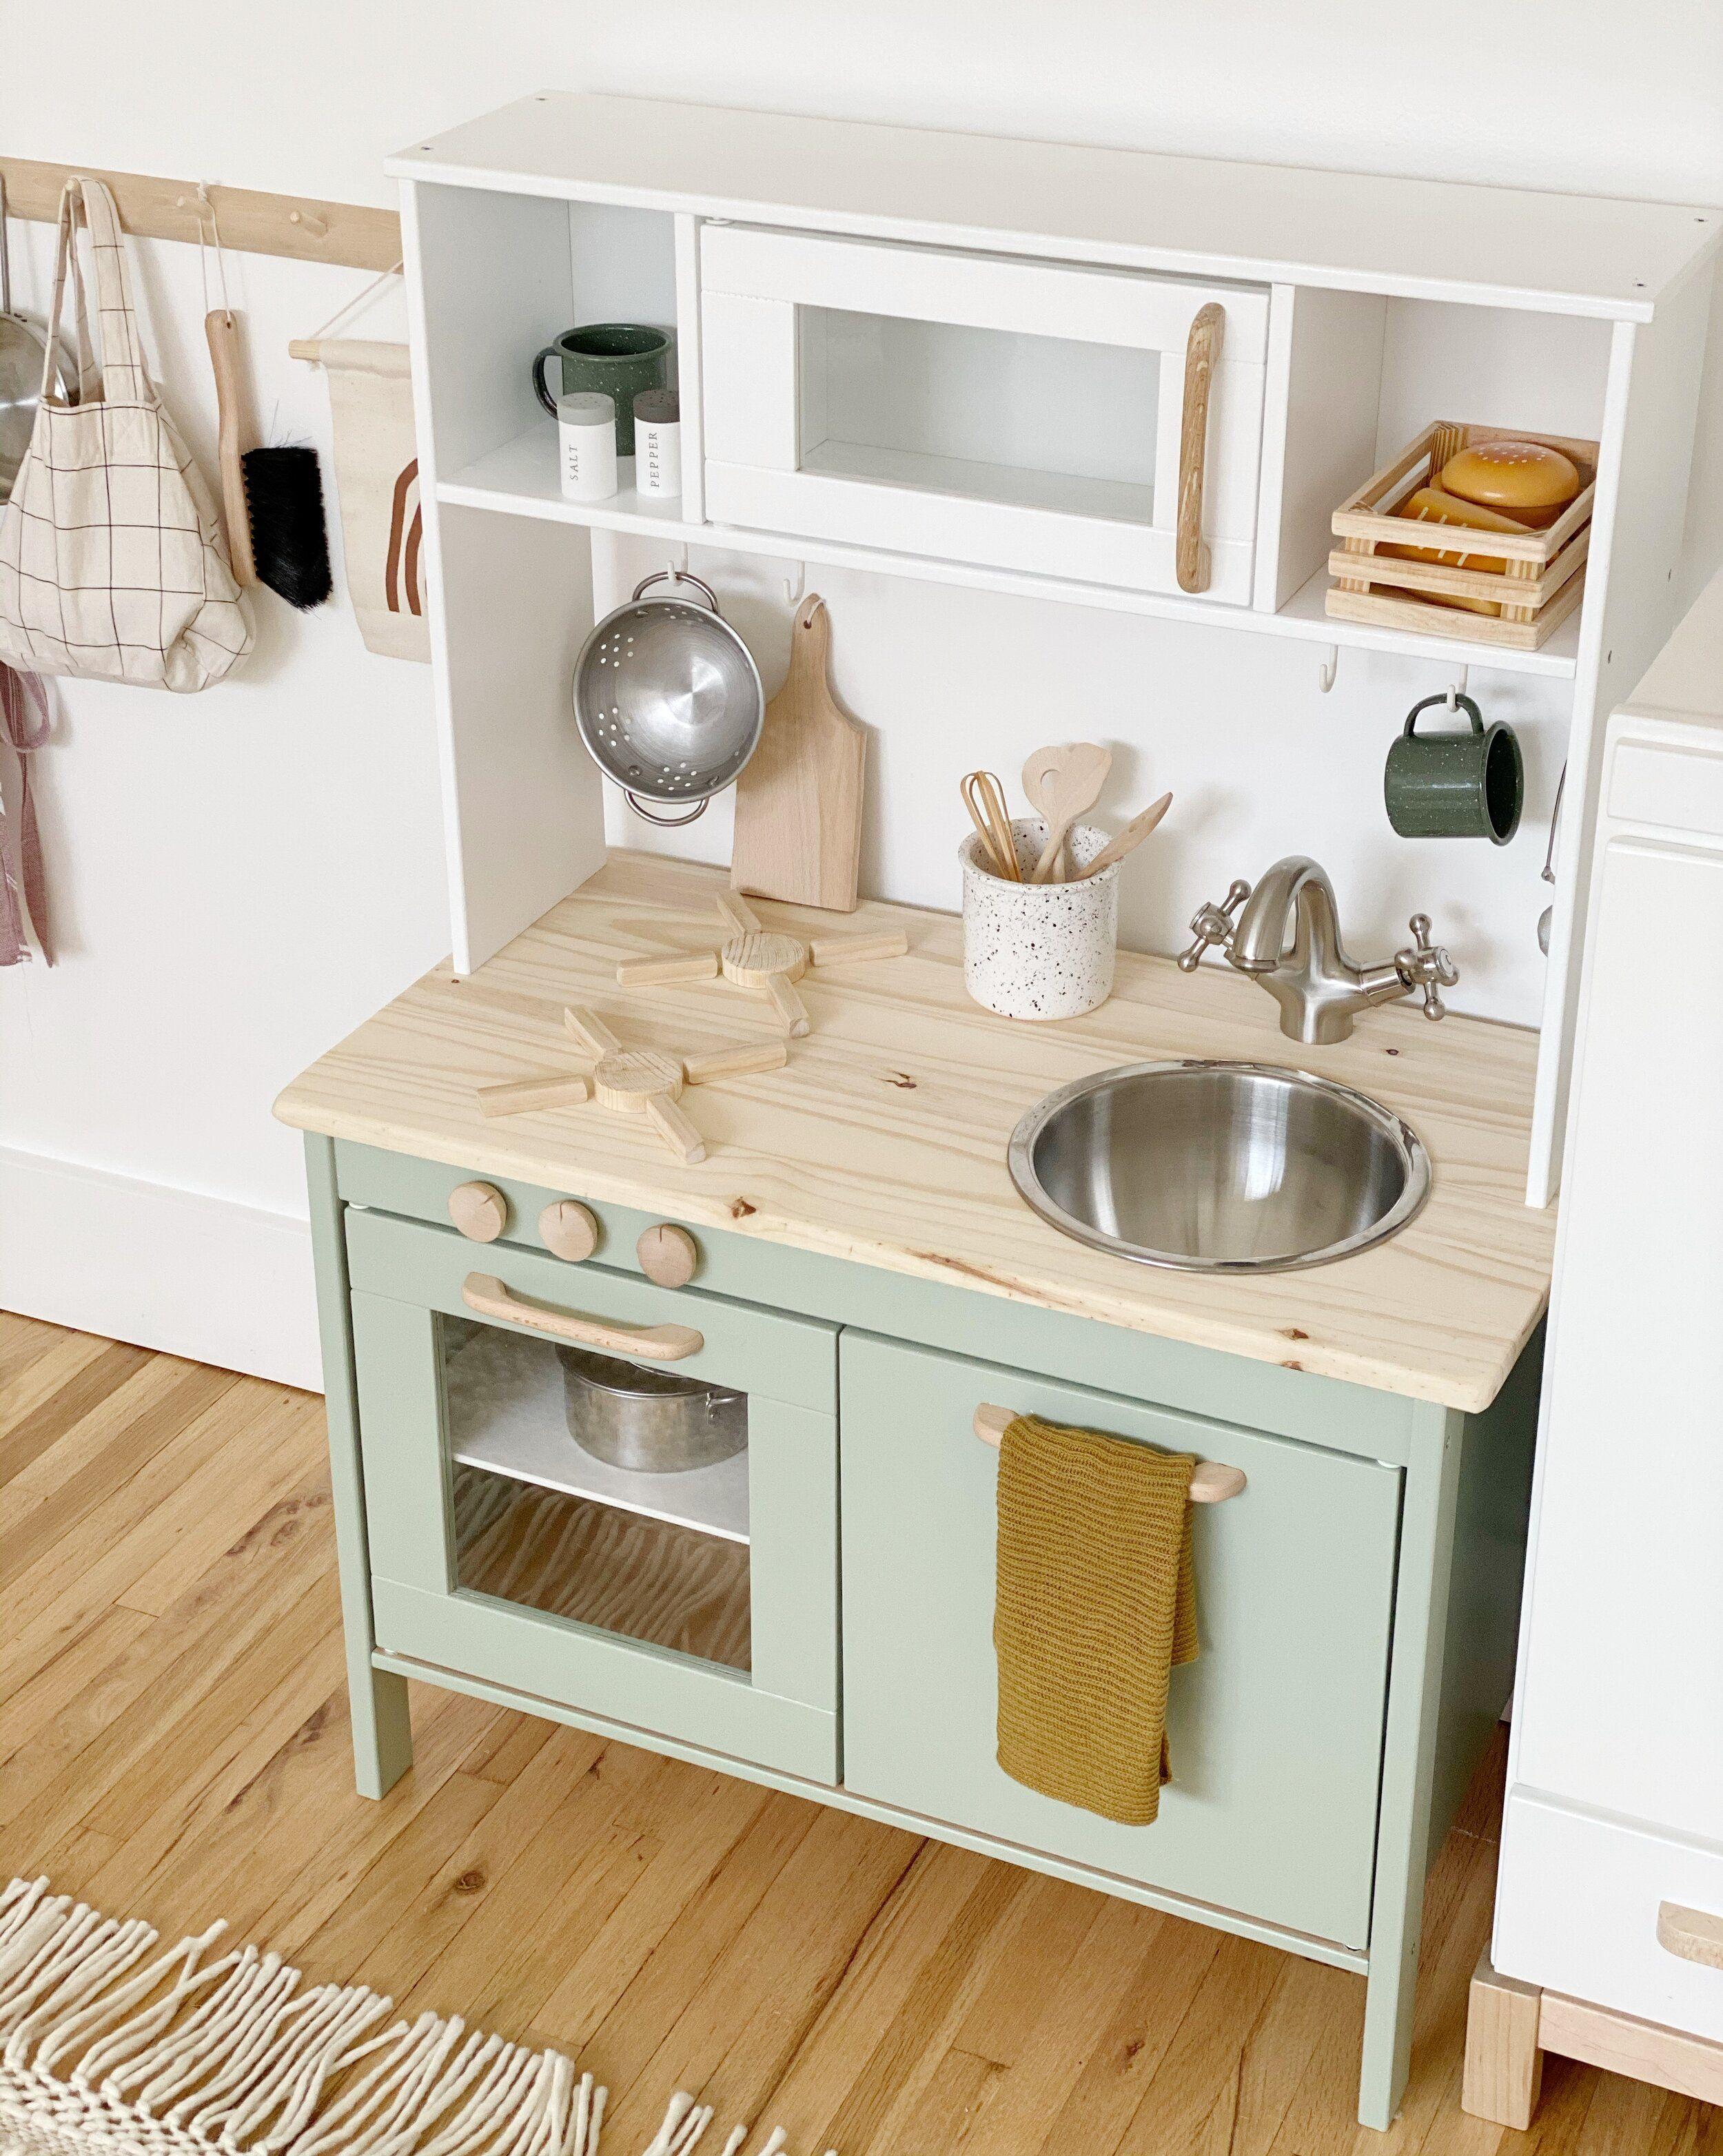 Ikea play kitchen hack — in 2020 Ikea play kitchen